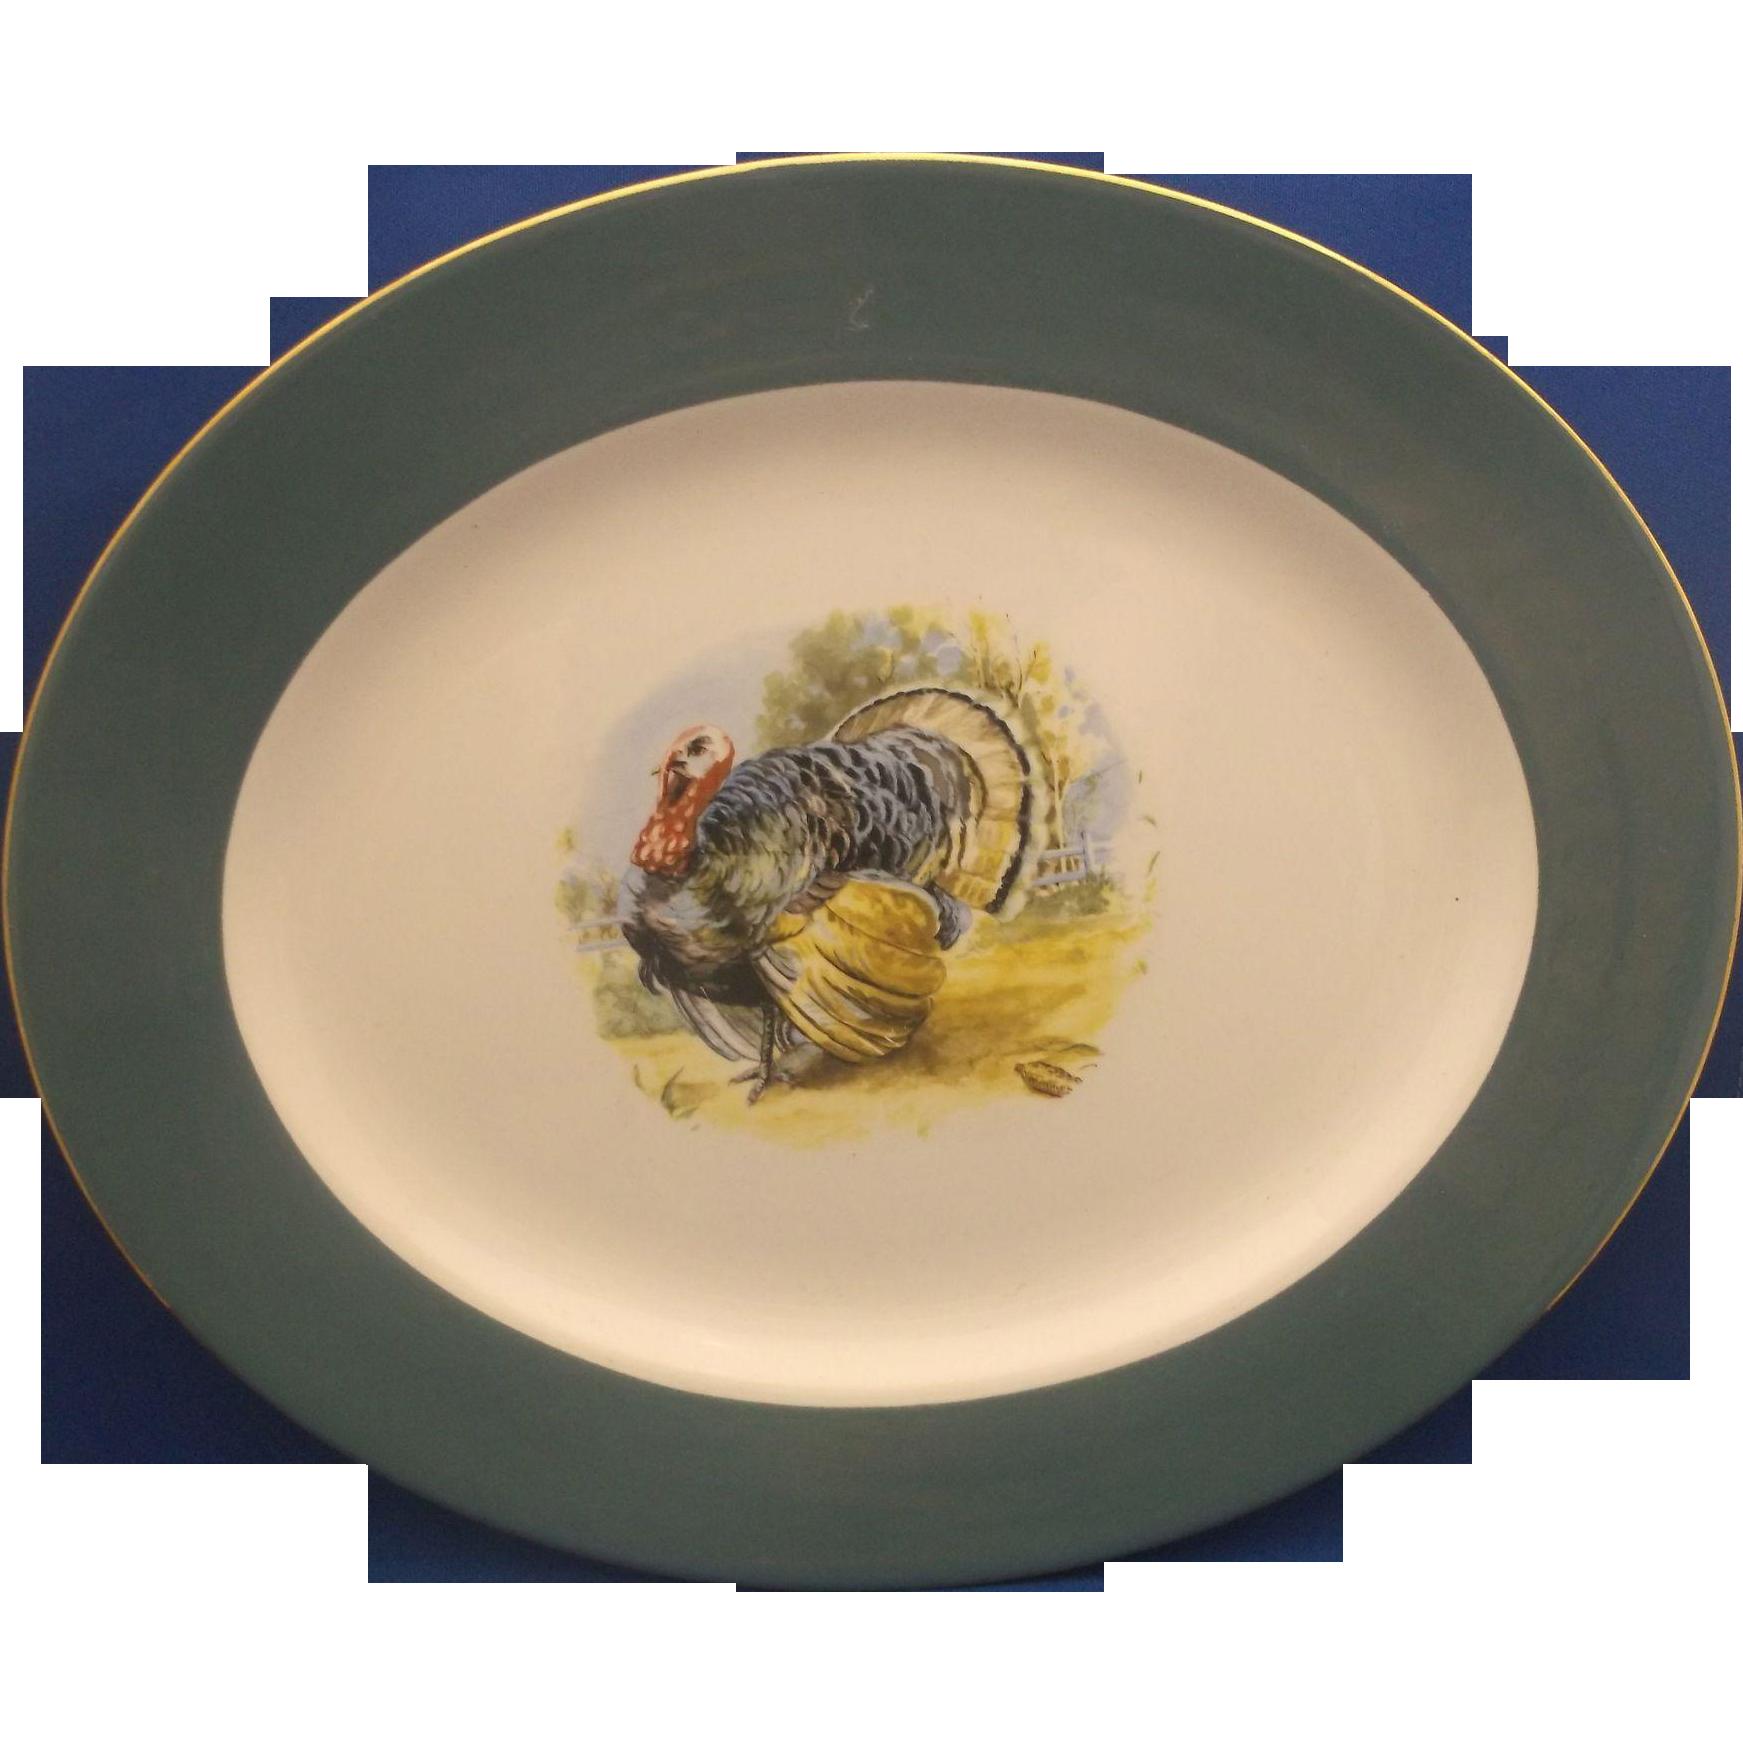 Homer Laughlin Eggshell Cavalier Turkey Platter Green Rim 13 IN 1950s